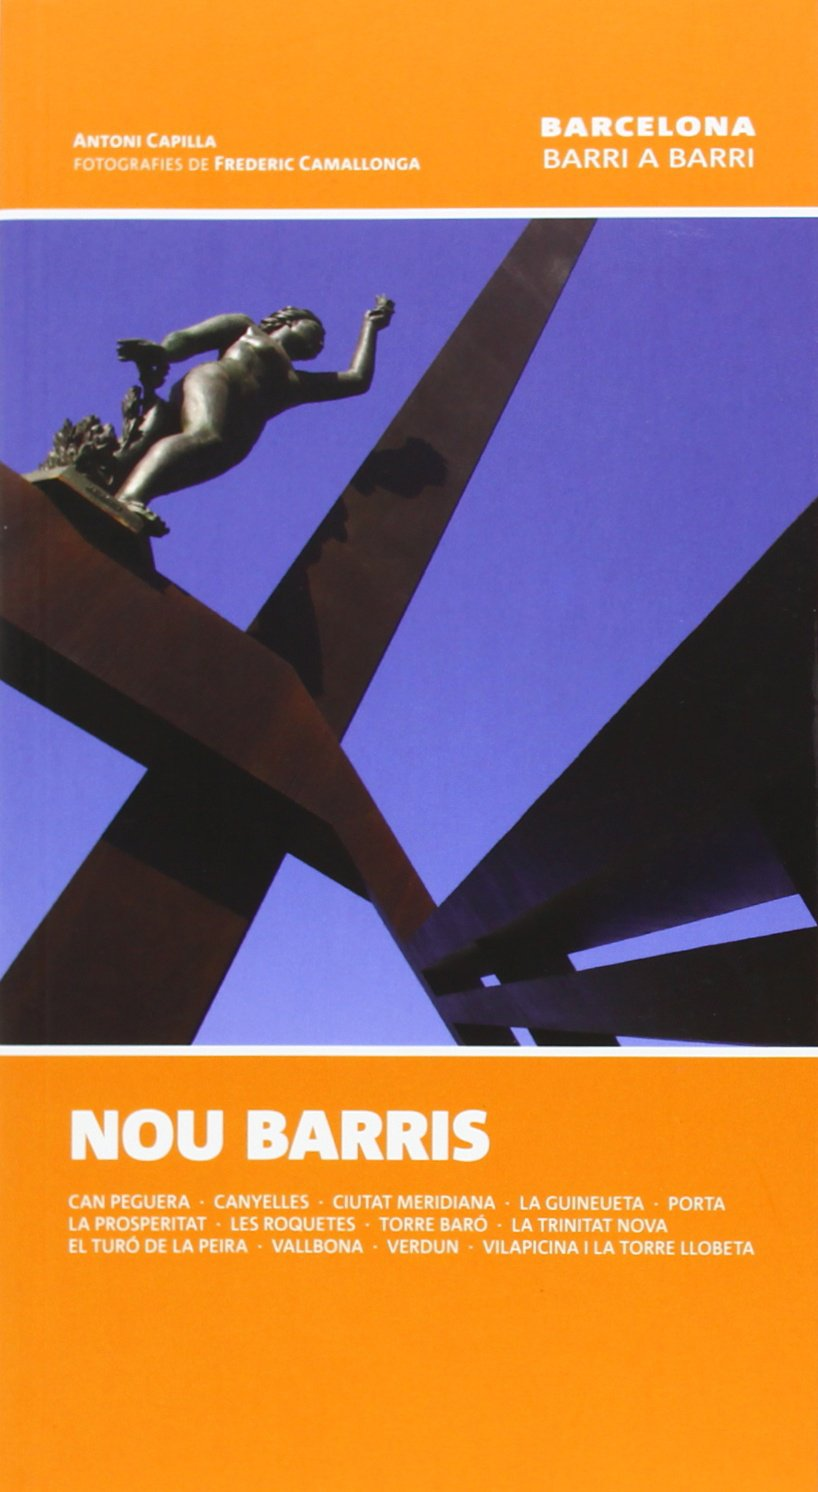 Nou Barris (Barcelona barri a barri): Amazon.es: Capilla Martínez, Antoni, Camallonga, Frederic: Libros